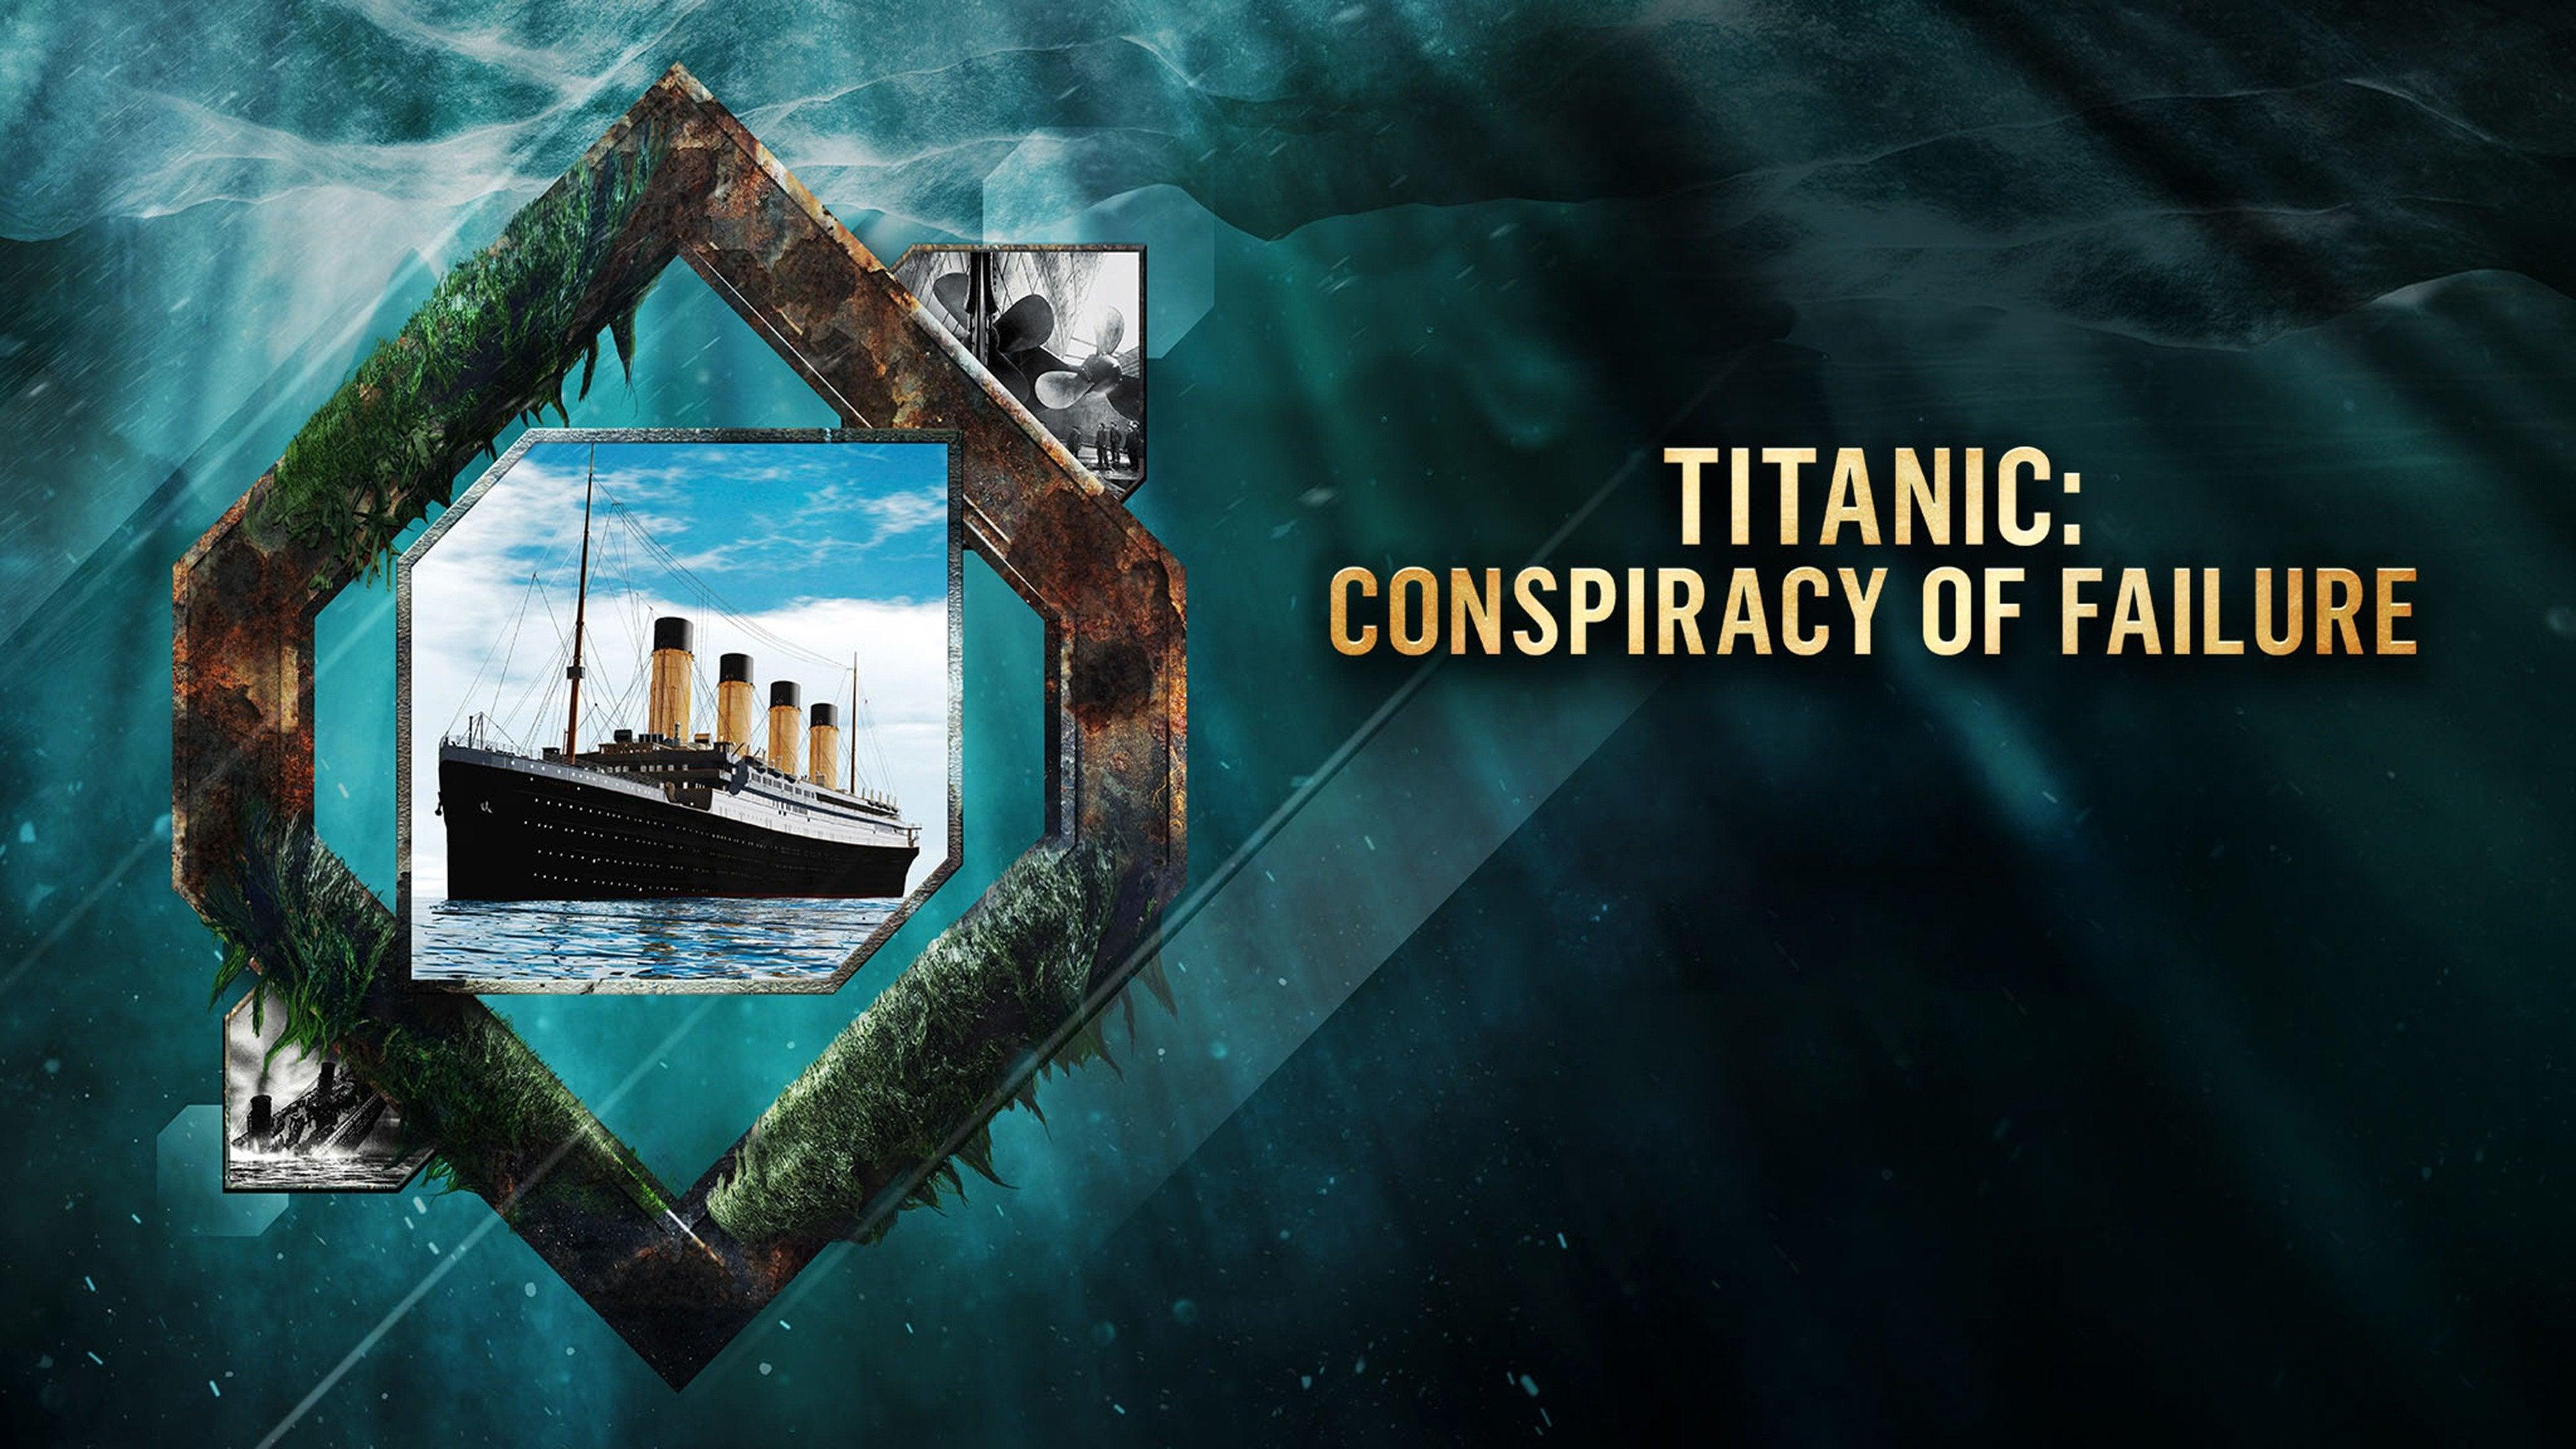 Titanic: Conspiracy of Failure